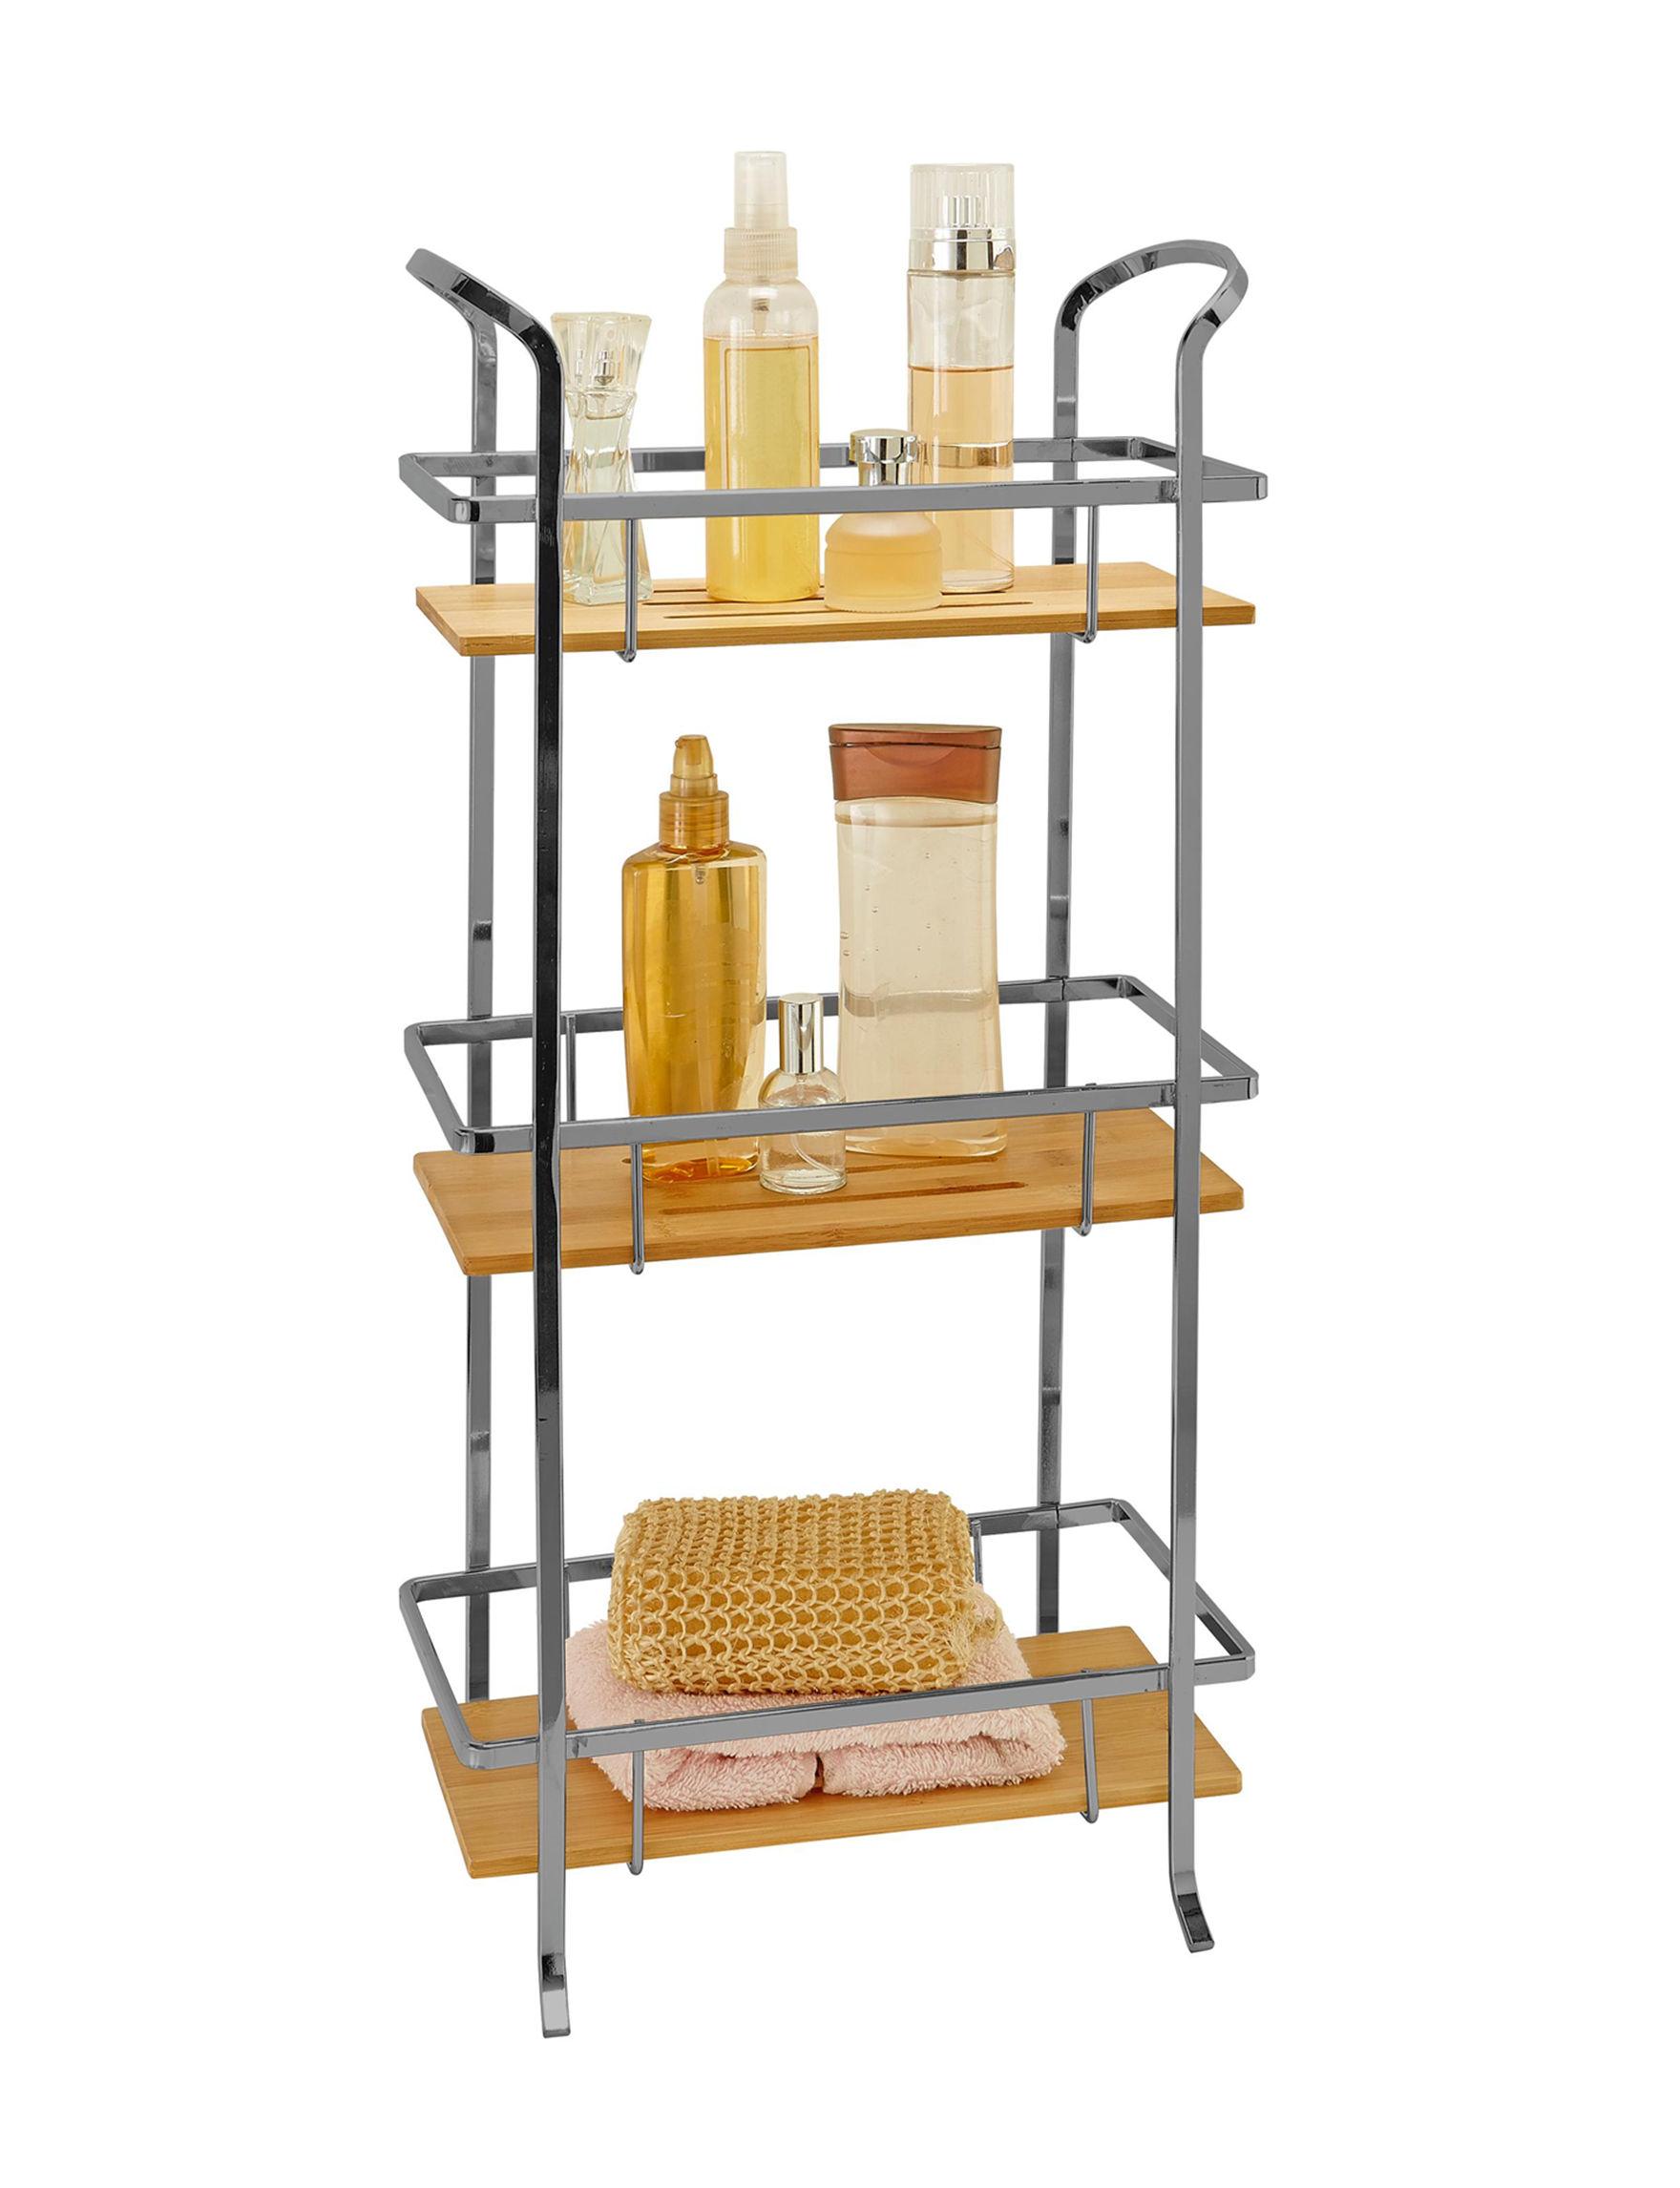 Laura Ashley Grey Storage Shelves Bath Accessories Storage & Organization